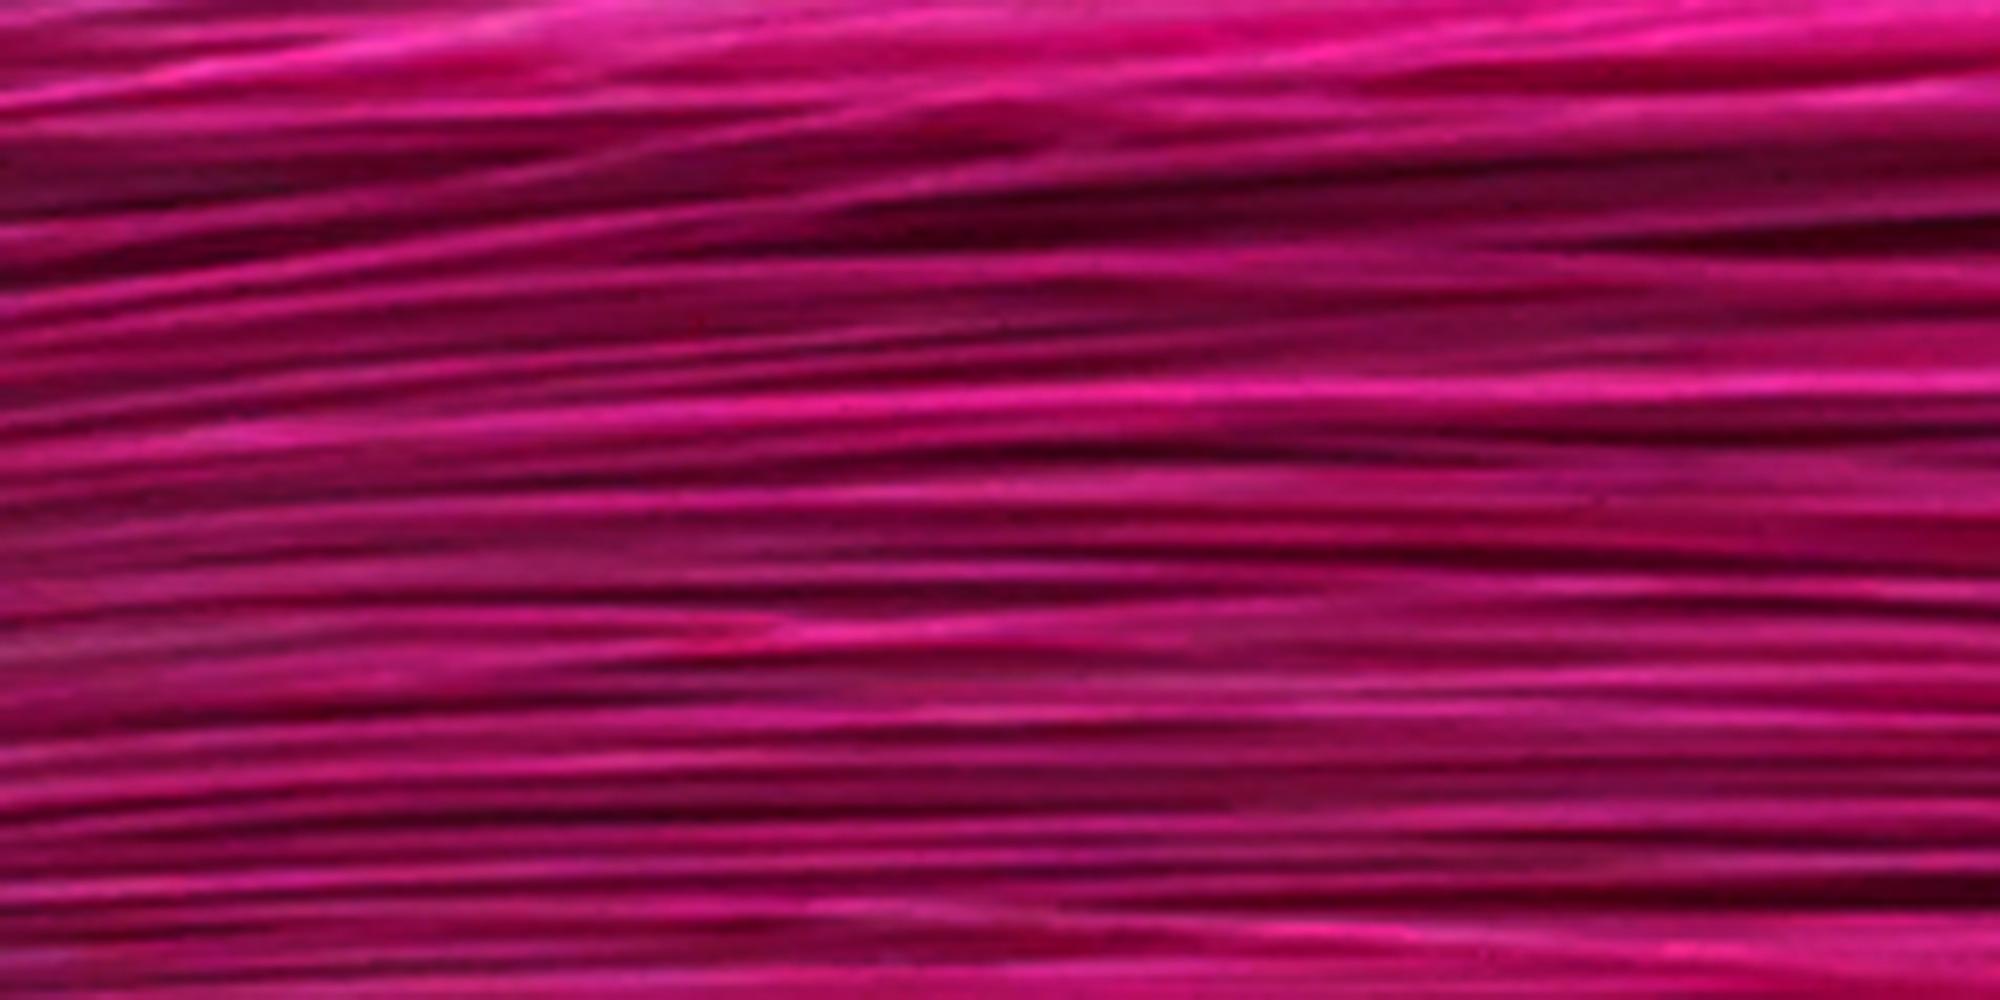 Stargazer-Baby-Hair-Extension-Synthetic-Clip-on-Streak-Various-Colors-43cm thumbnail 15